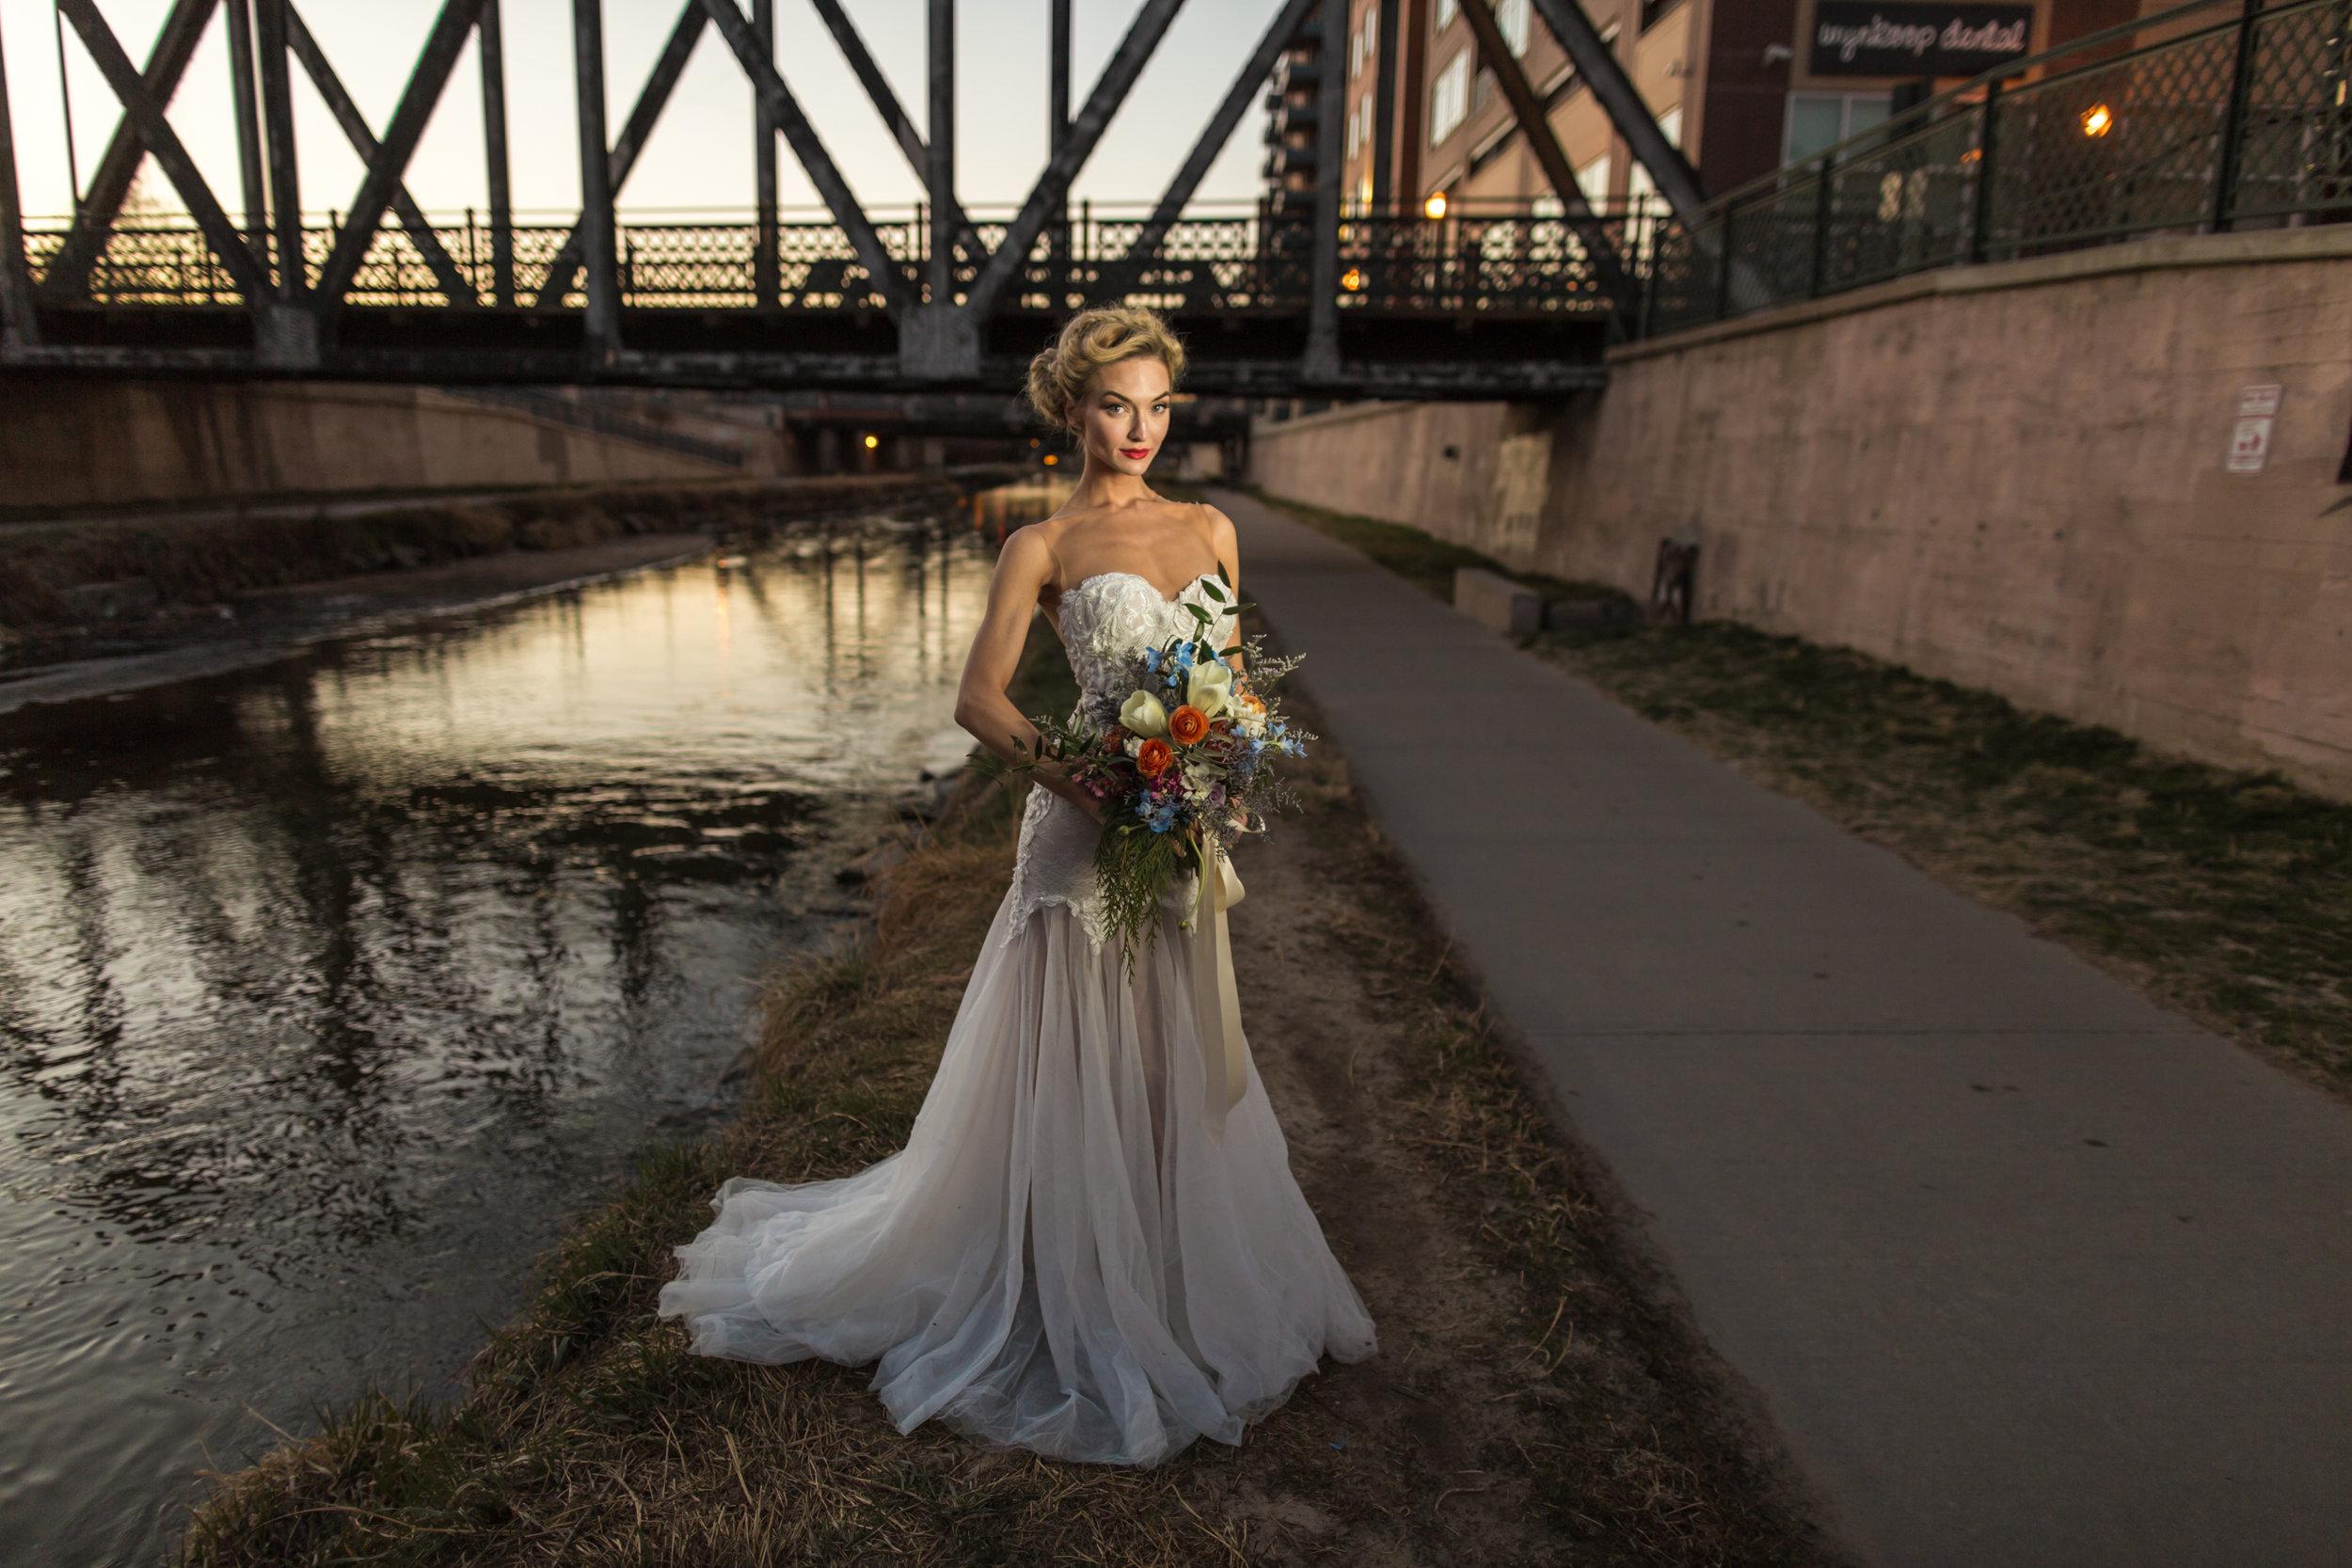 20160226-Moss-Denver-Aldabella-Photography-Milk-Glass-Production-0159.jpg